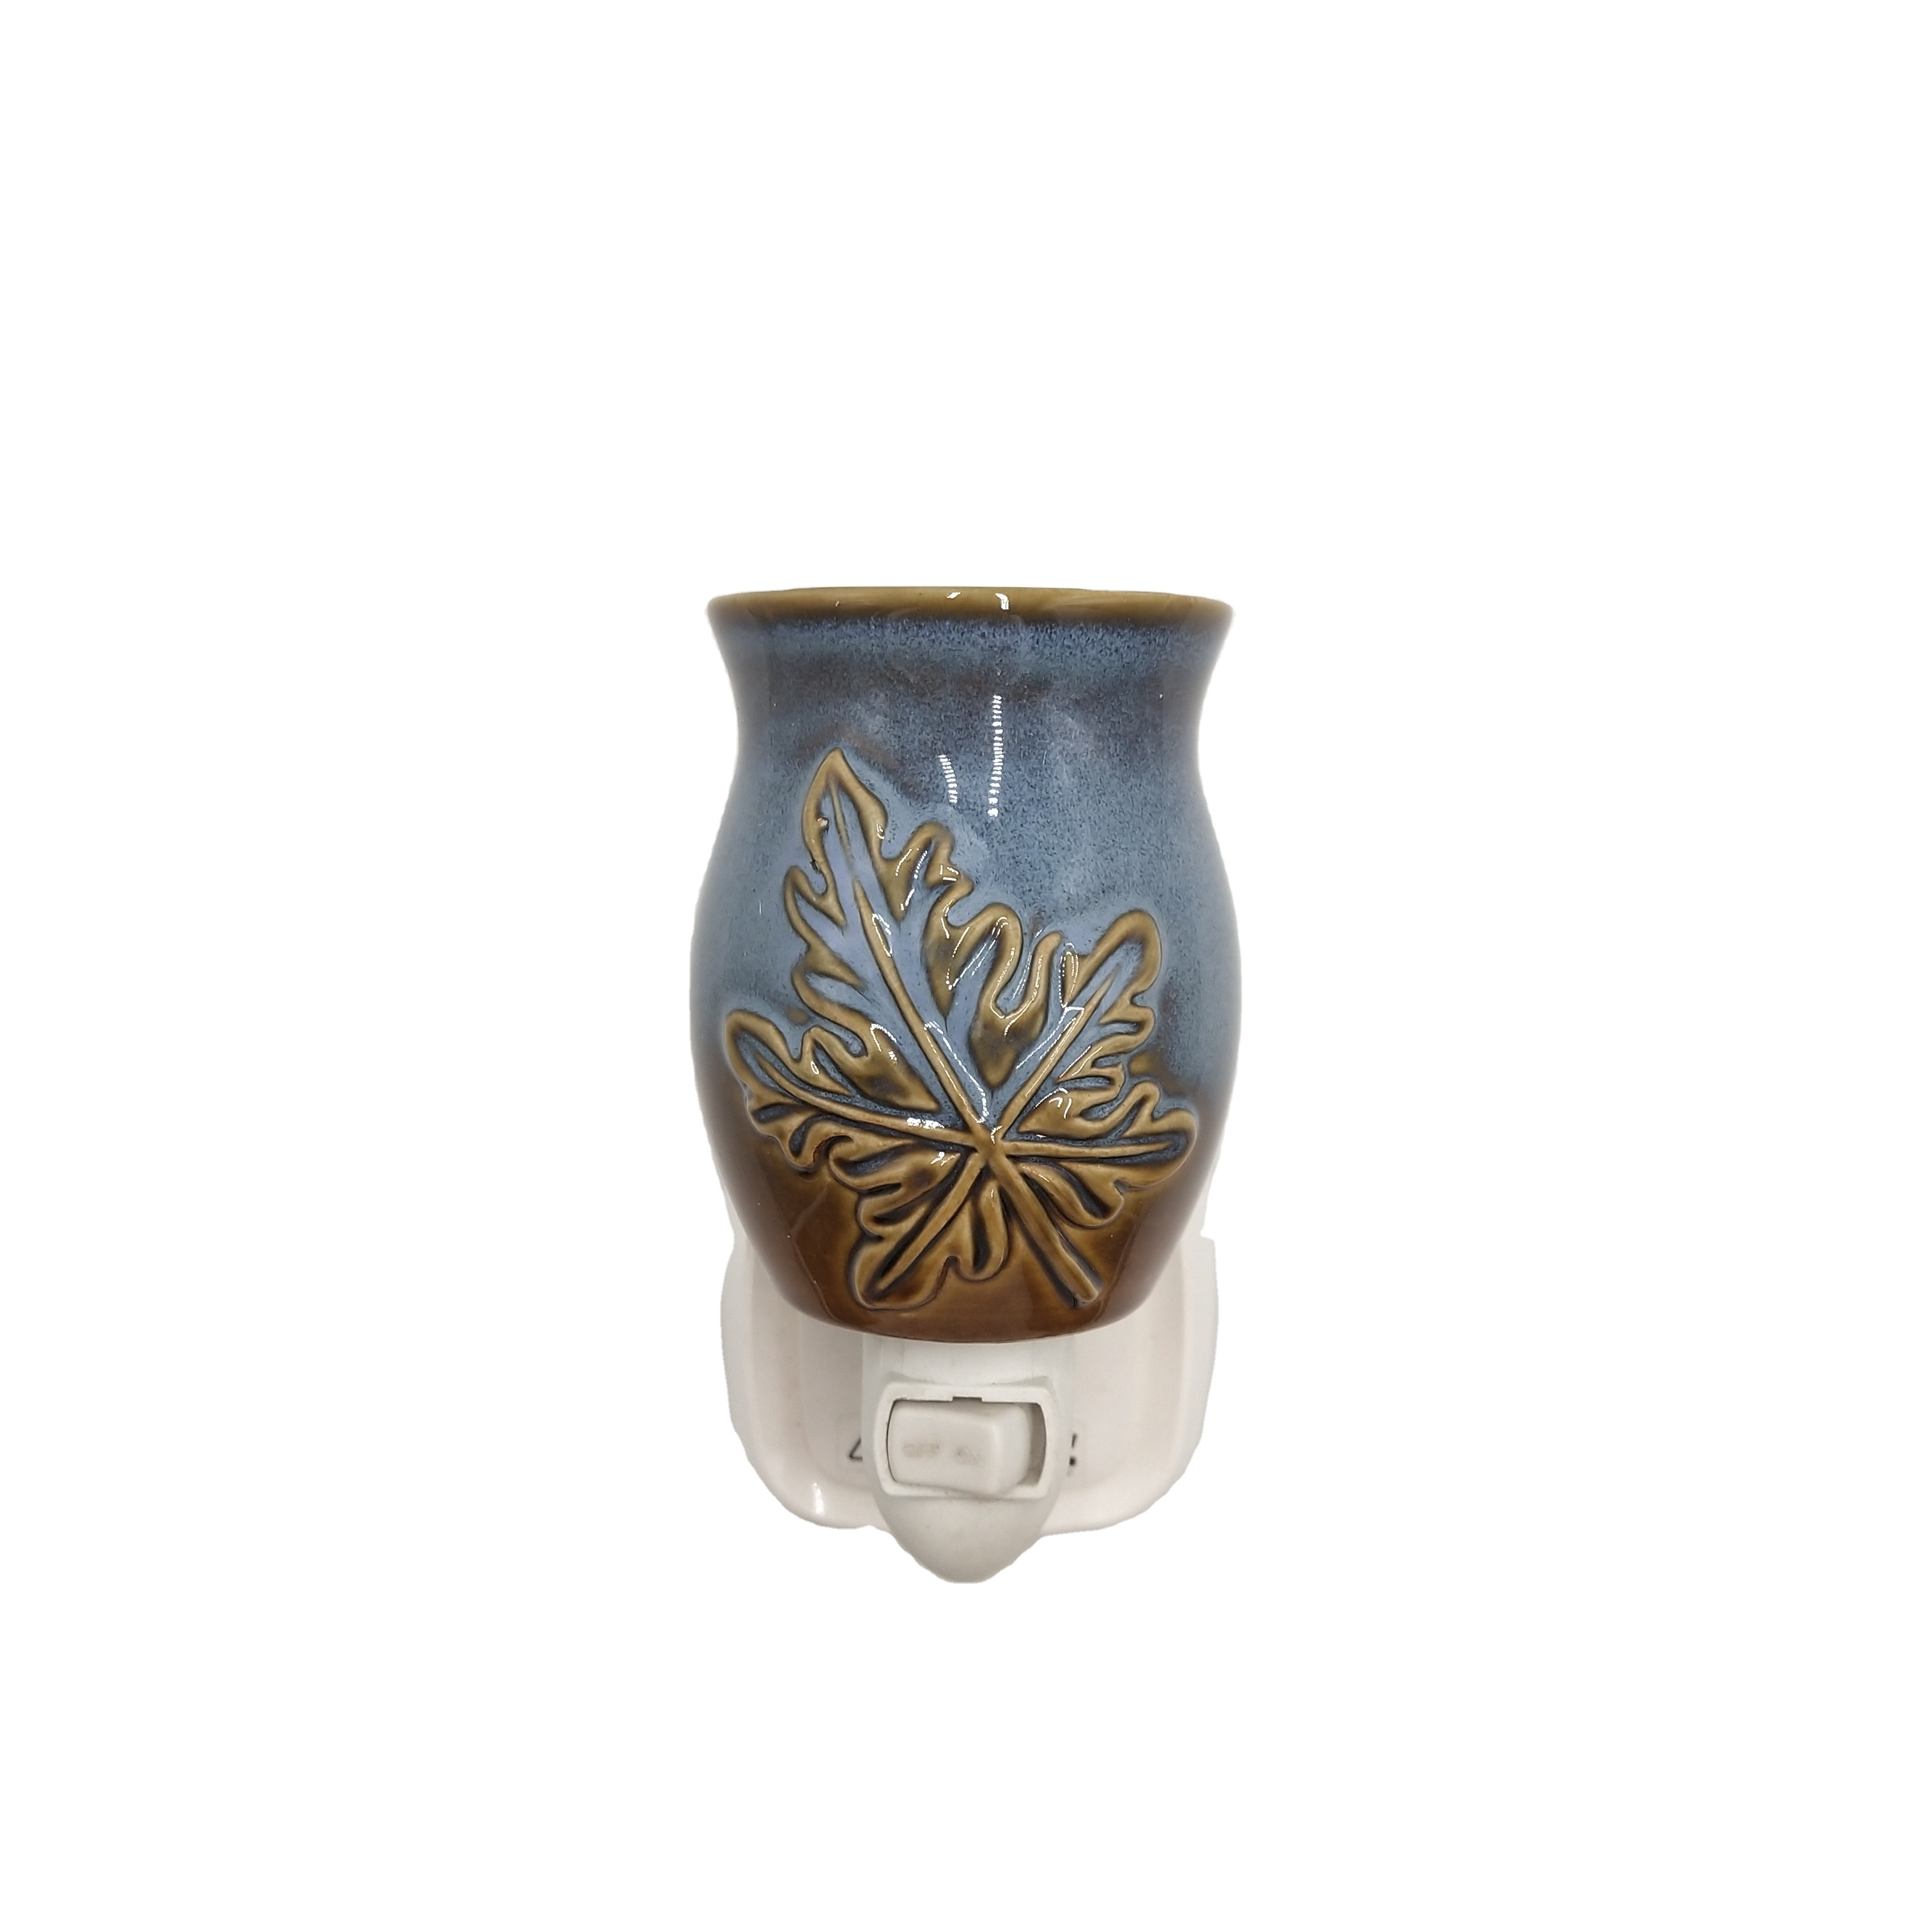 wholesale star style decoration essential electric aroma oil burner lamp plug in ceramic fragrance burner candle wax melt warmer